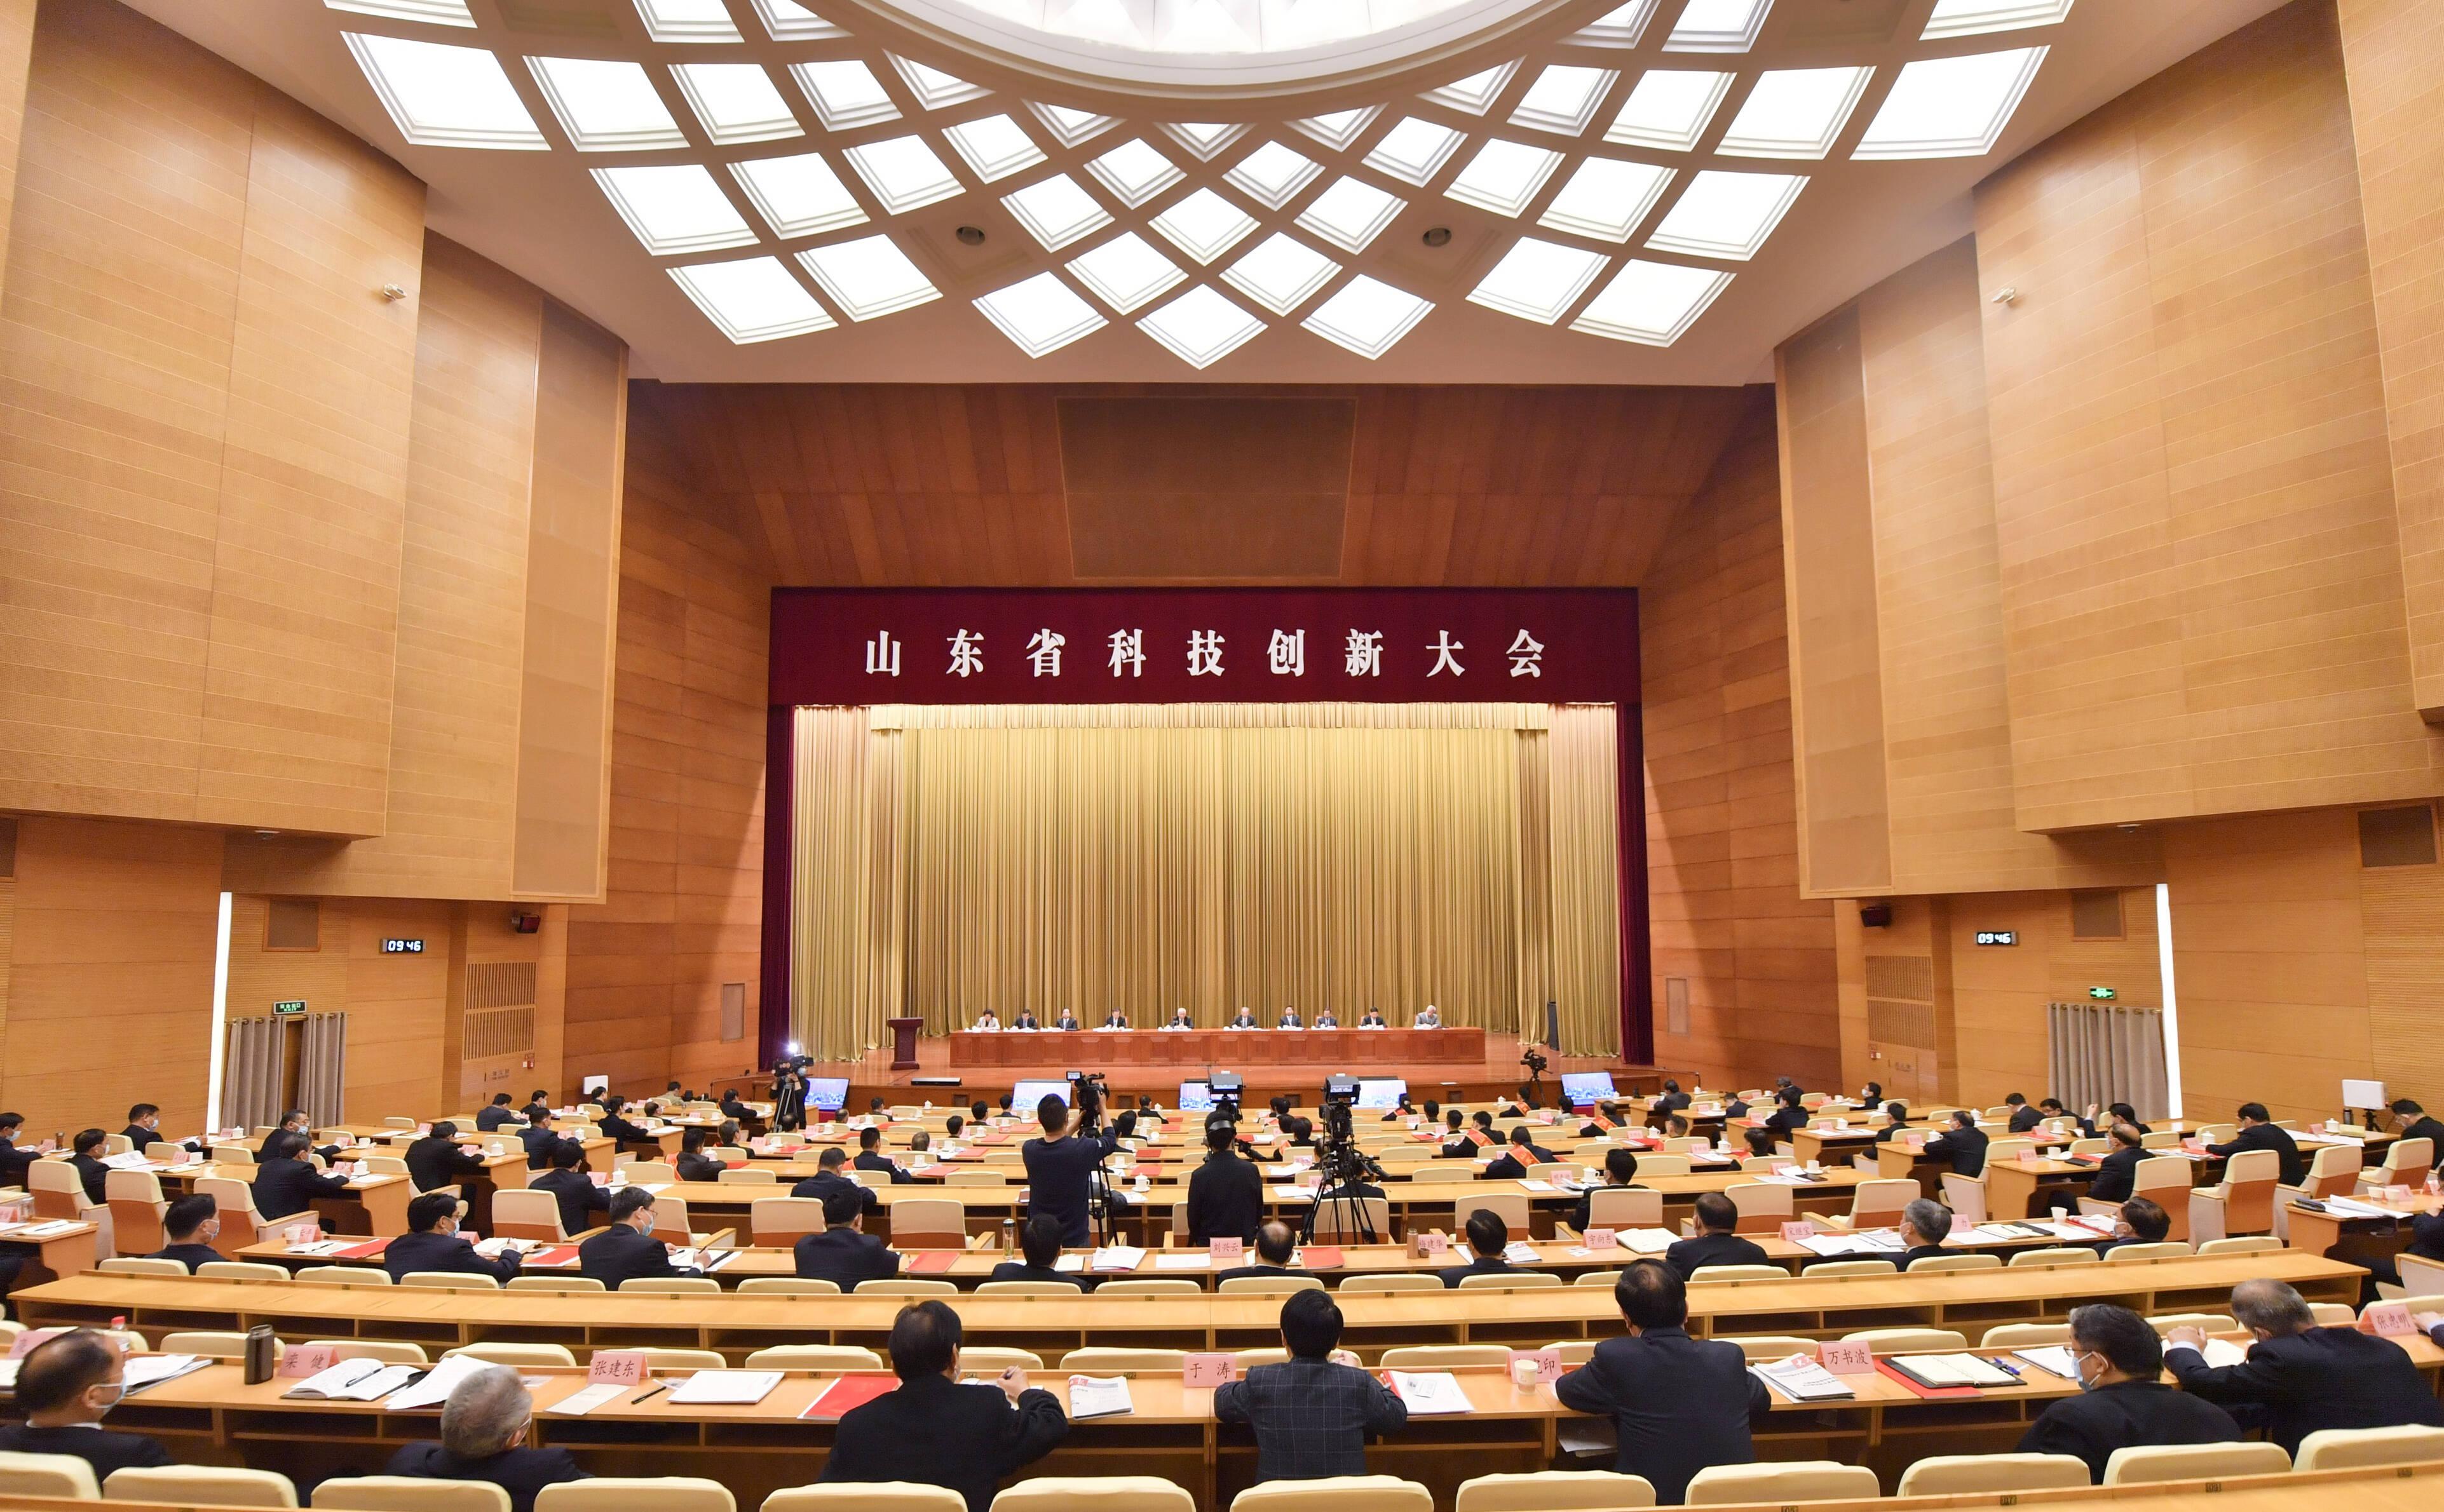 V观时政|山东省科技创新大会召开 273个项目(人选)获表彰